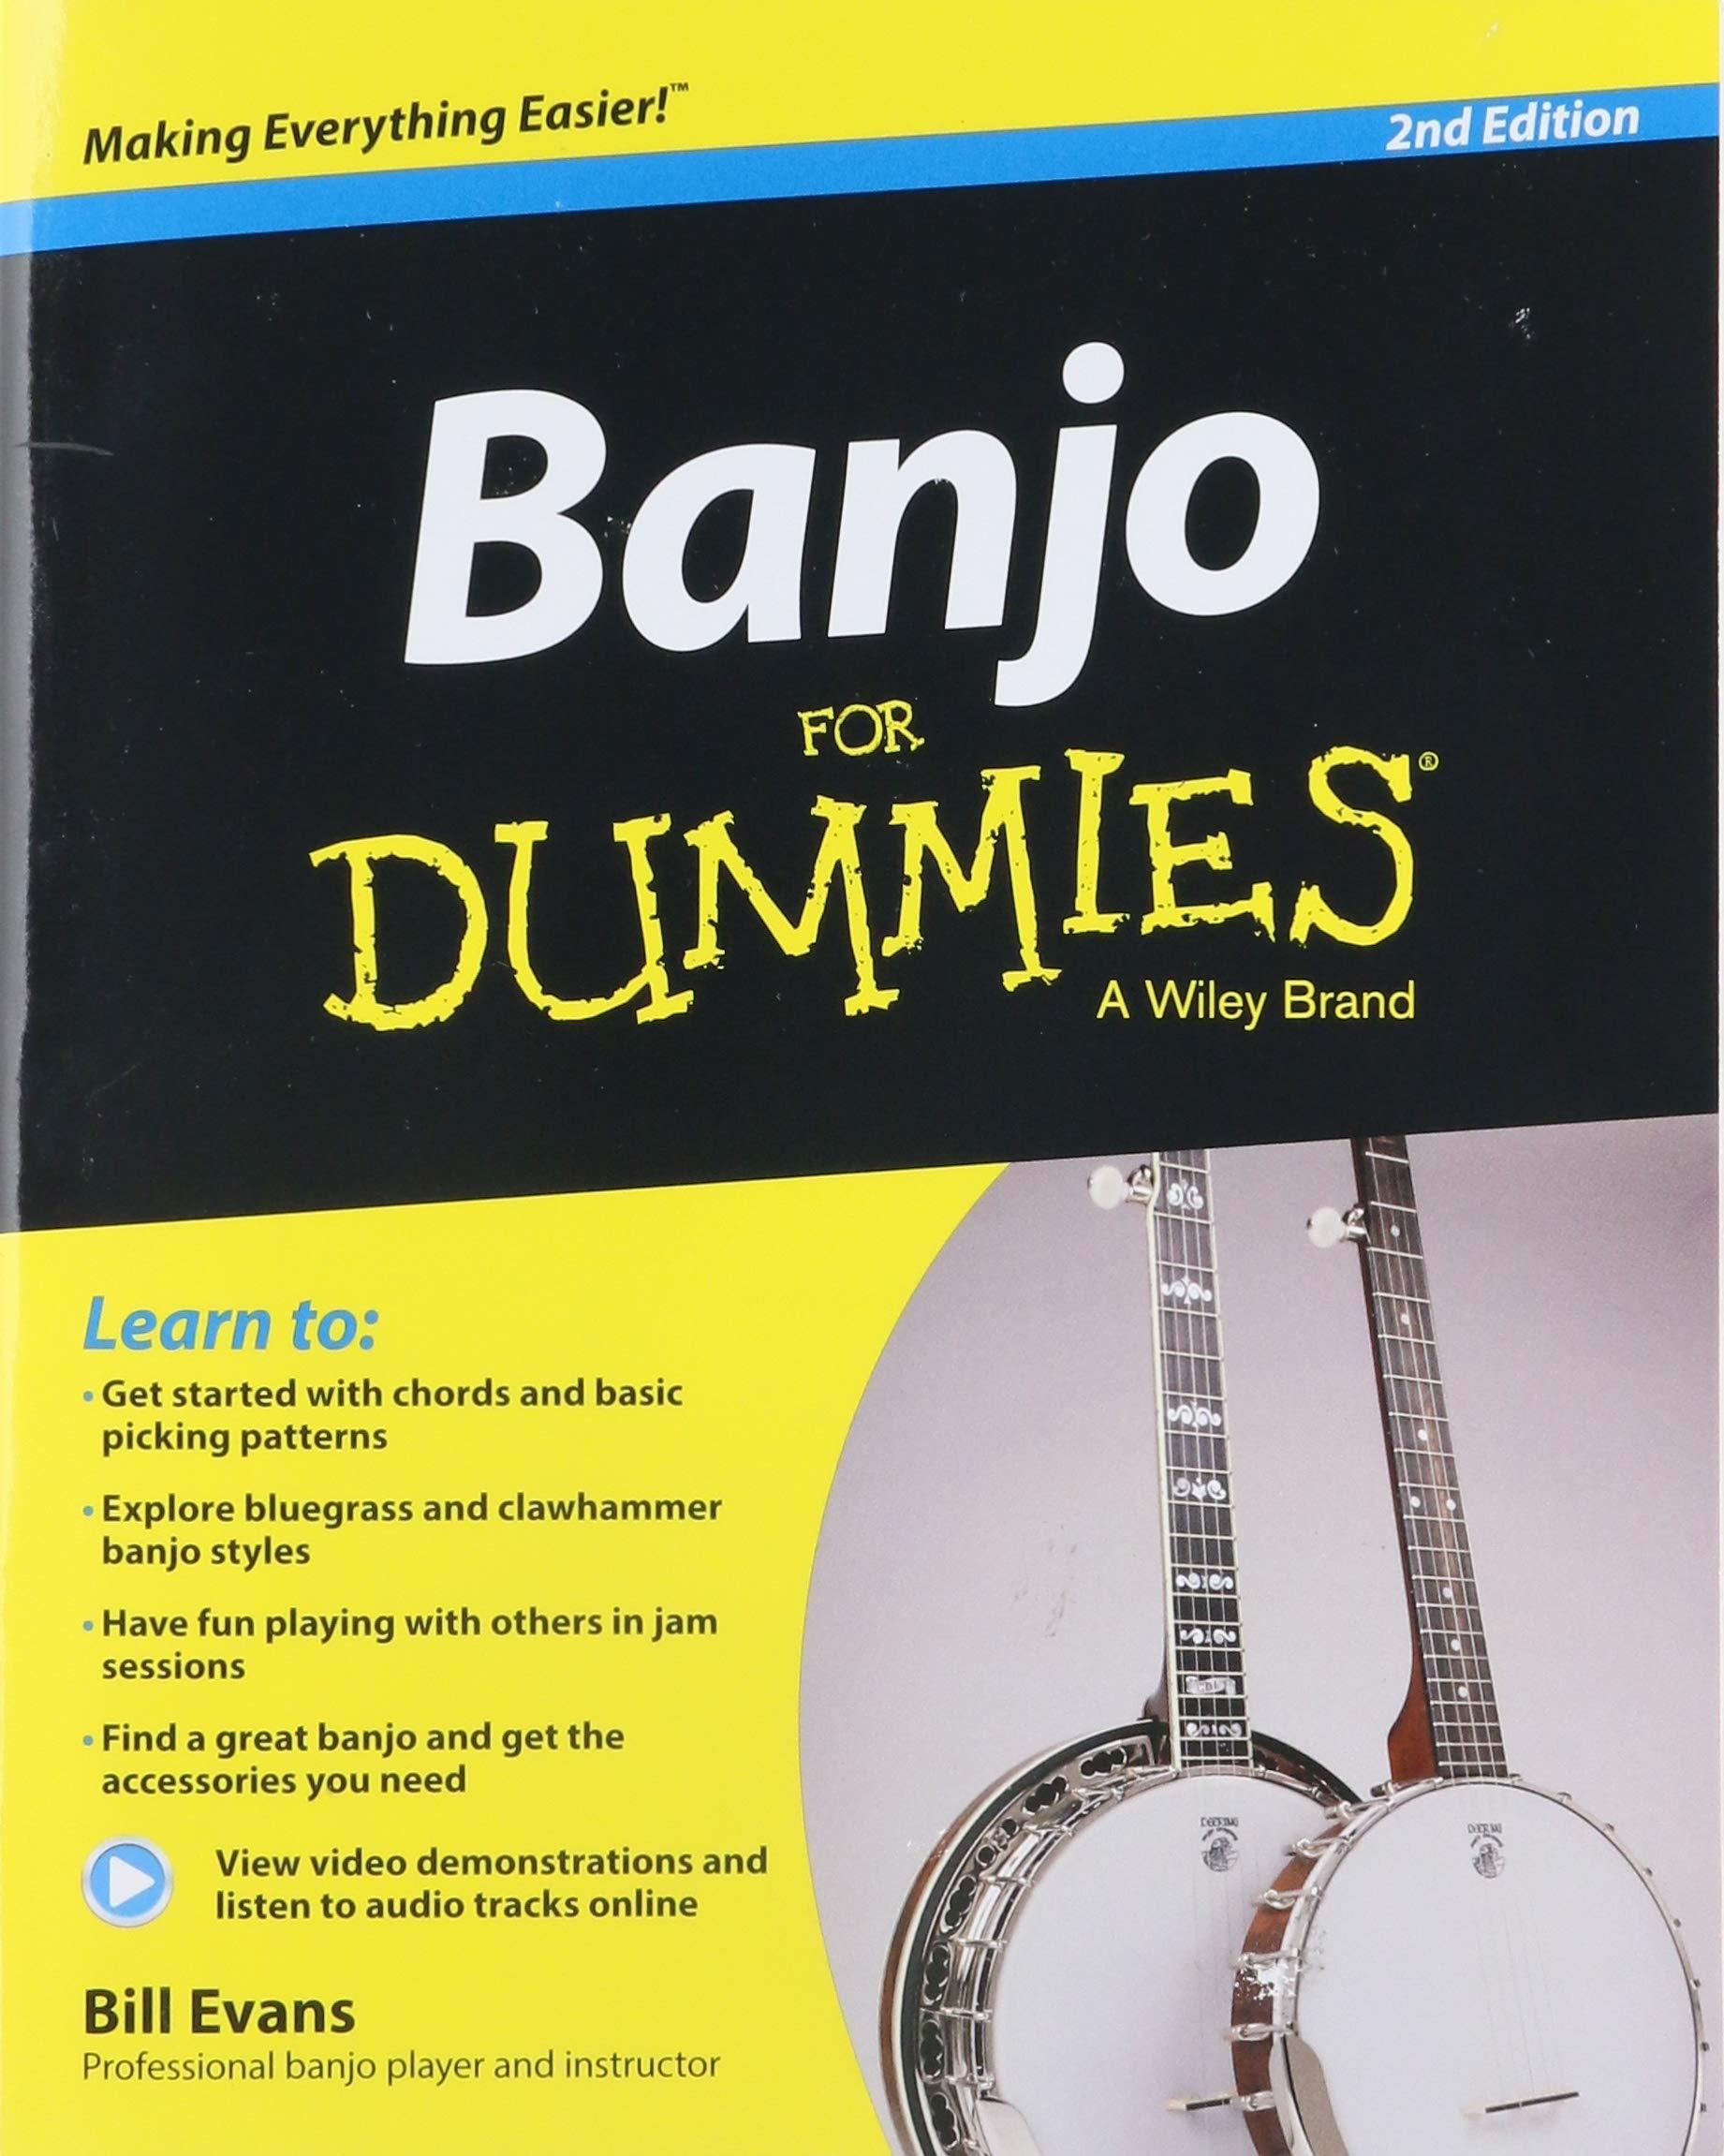 Banjo for Dummies: Amazon co uk: Bill Evans: Books